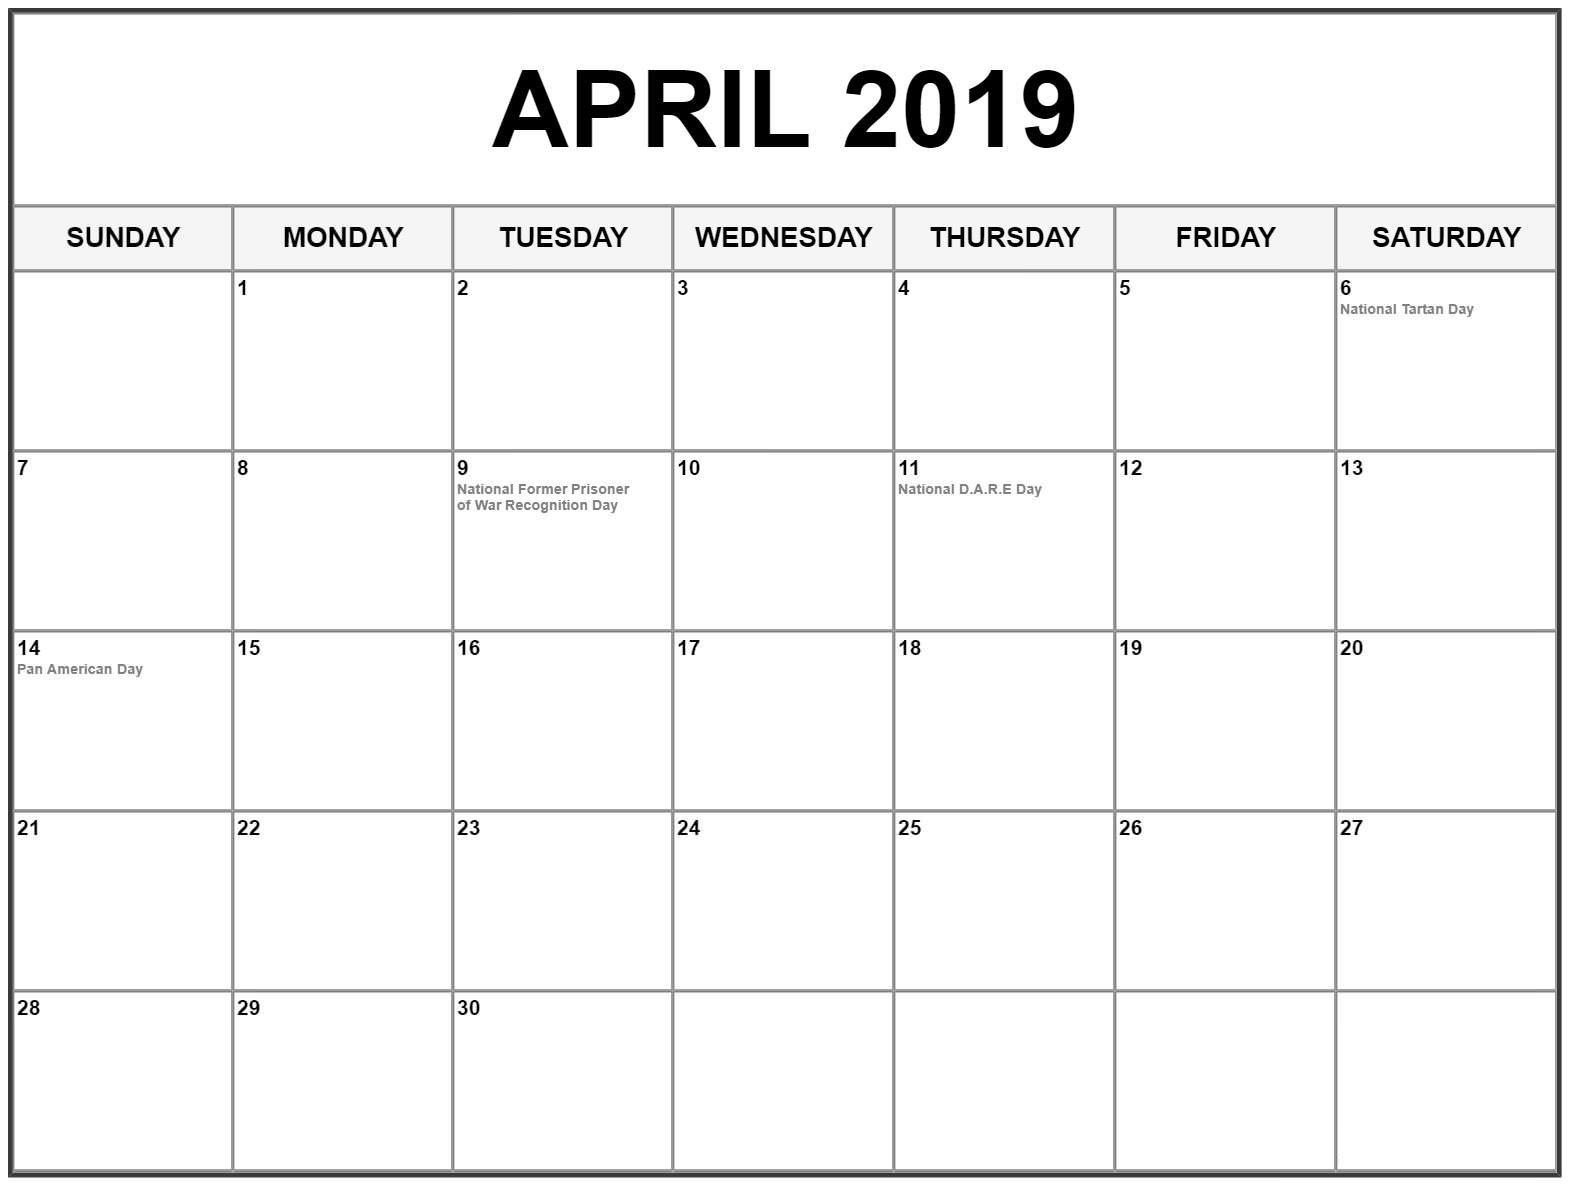 April 2019 Calendar Printable Template - Free Printable Calendar Calendar Of 2019 April